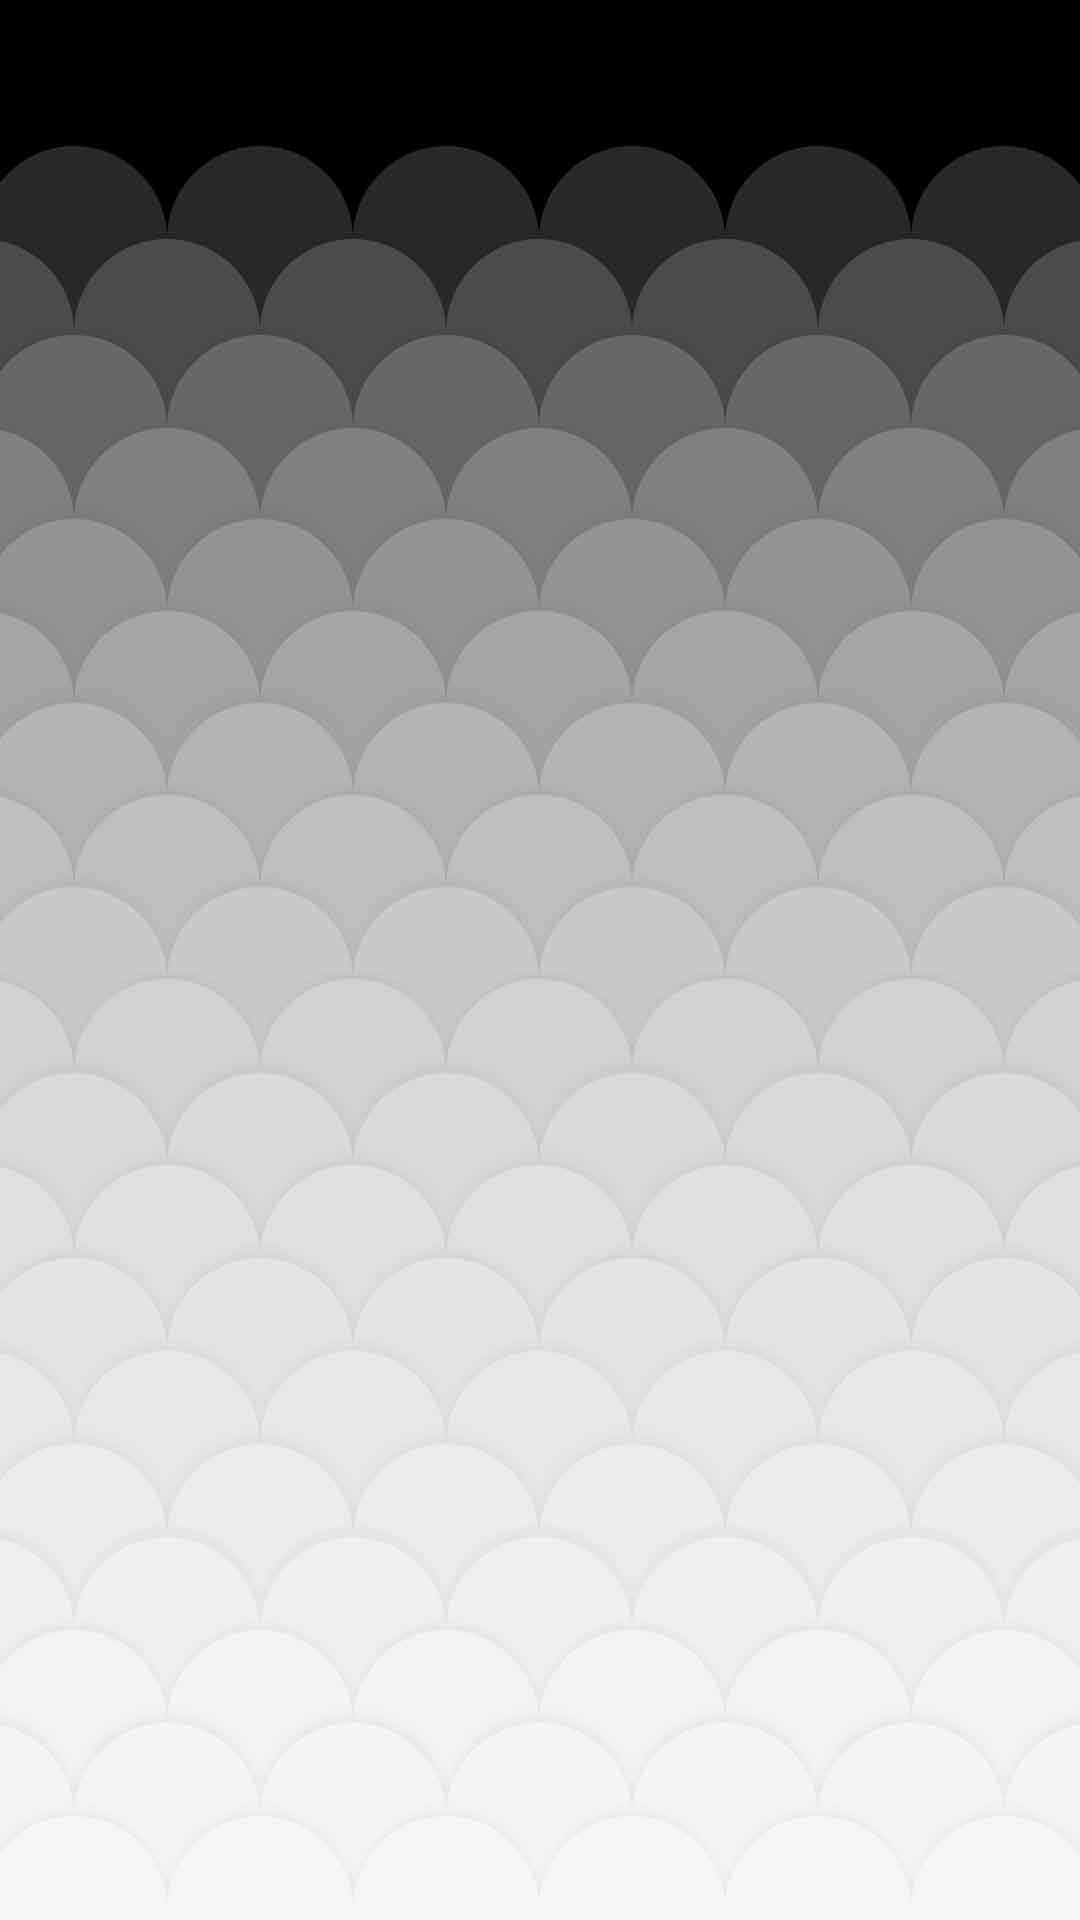 black and grey wallpaper